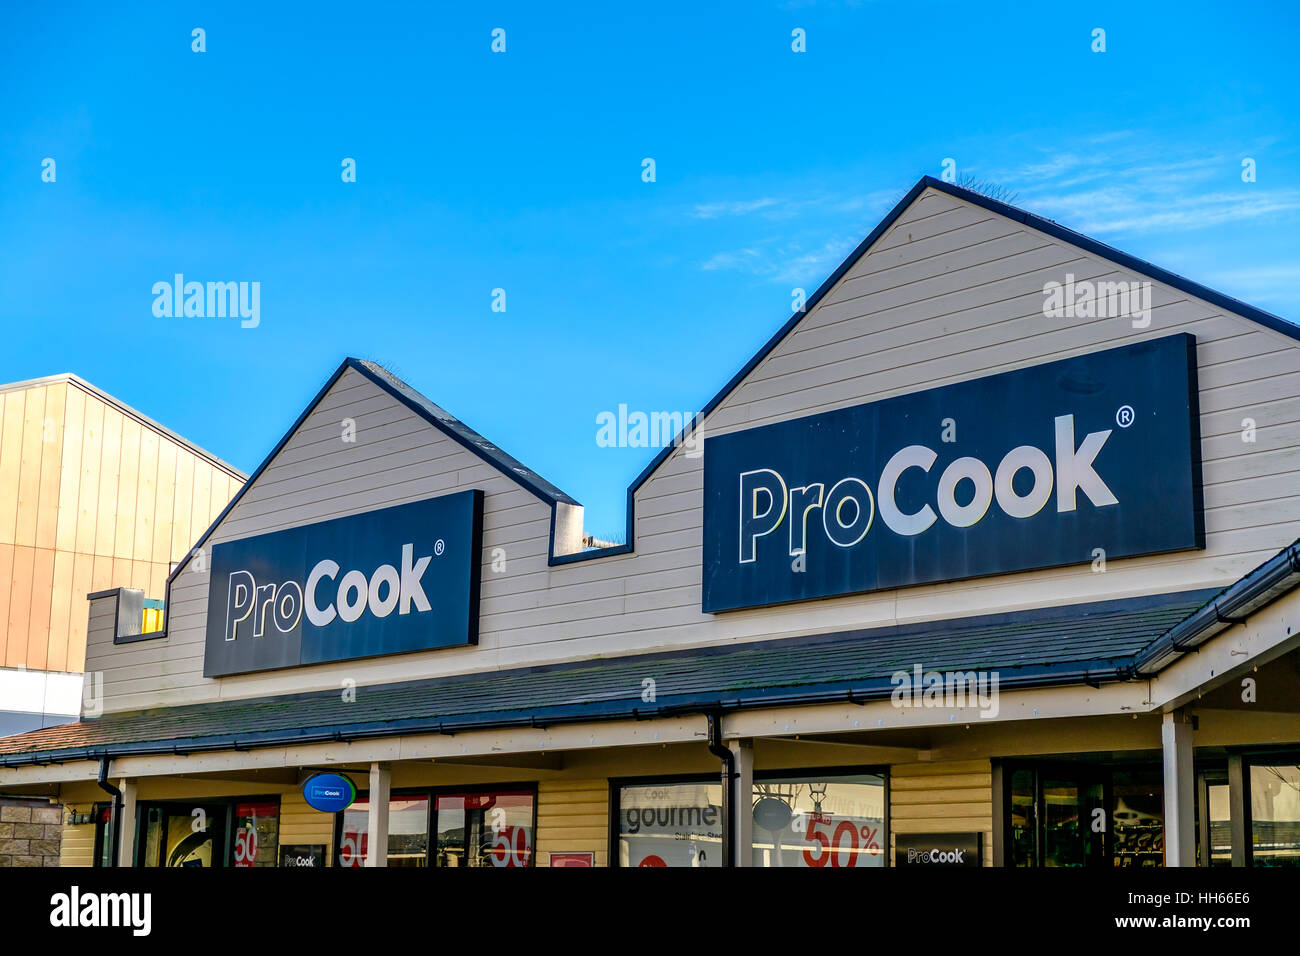 Pro Cook Shop Freeport - Stock Image